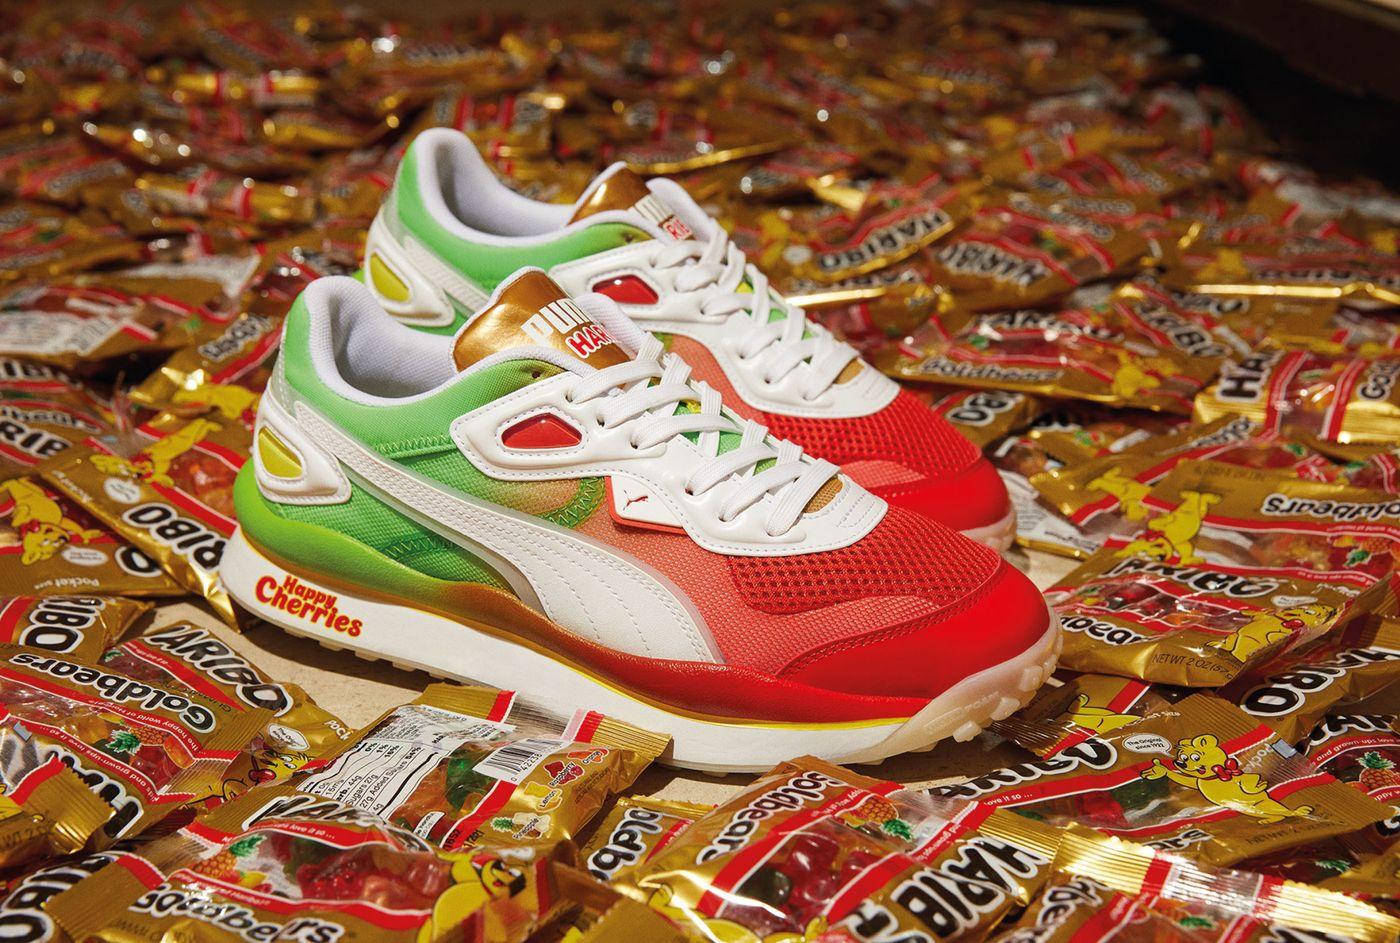 Haribo x Puma Footwear